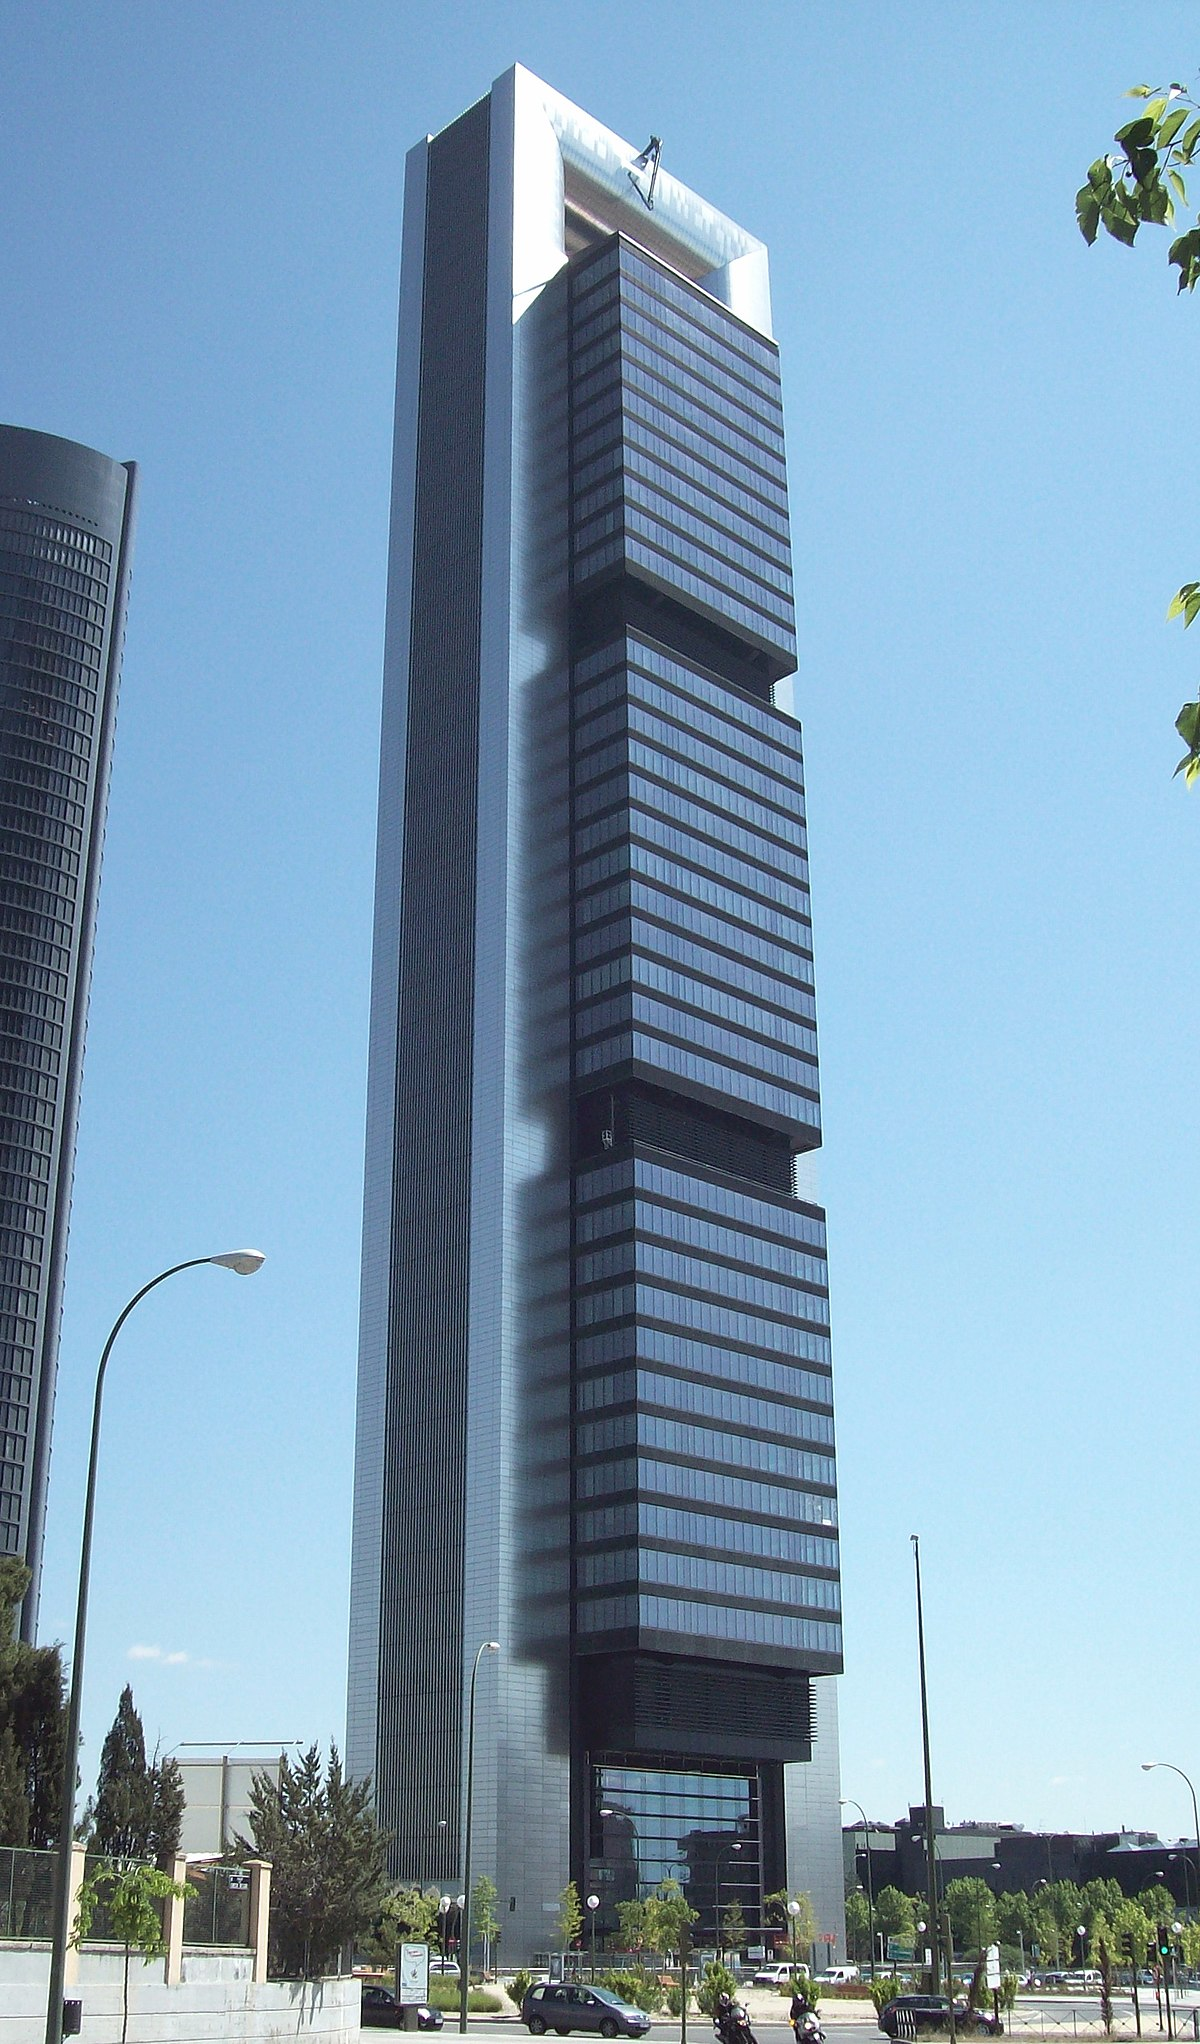 Architettura A Madrid torre cepsa - wikipedia